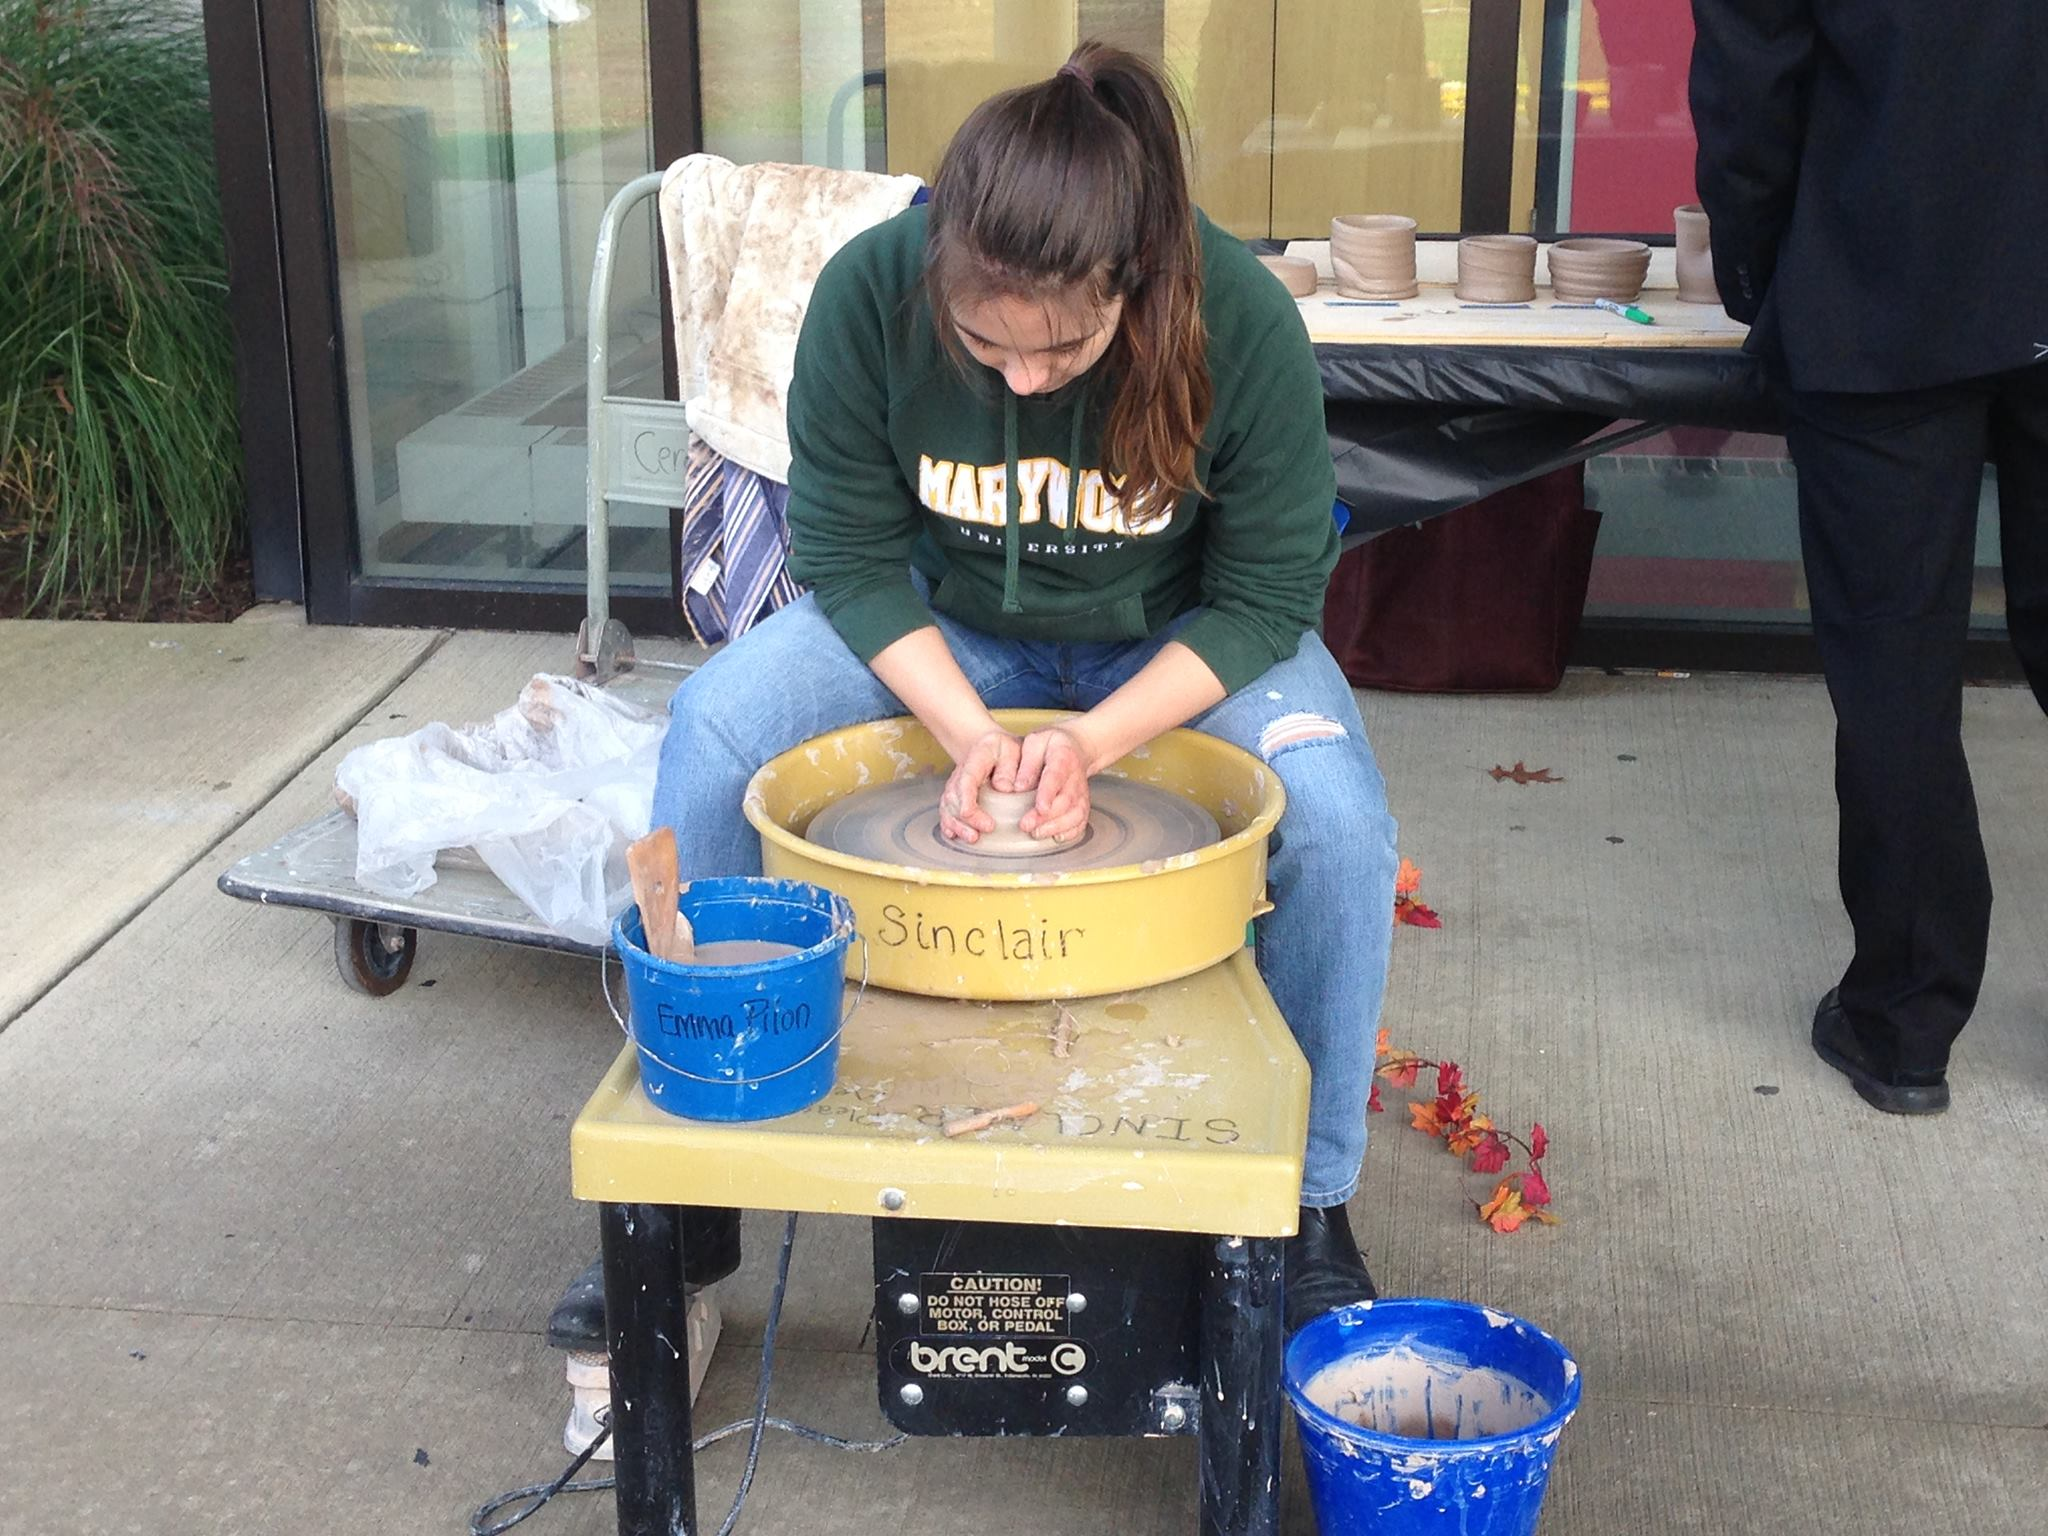 Senior ceramics/art administration major Emma Pilon does a pottery demonstration for students.